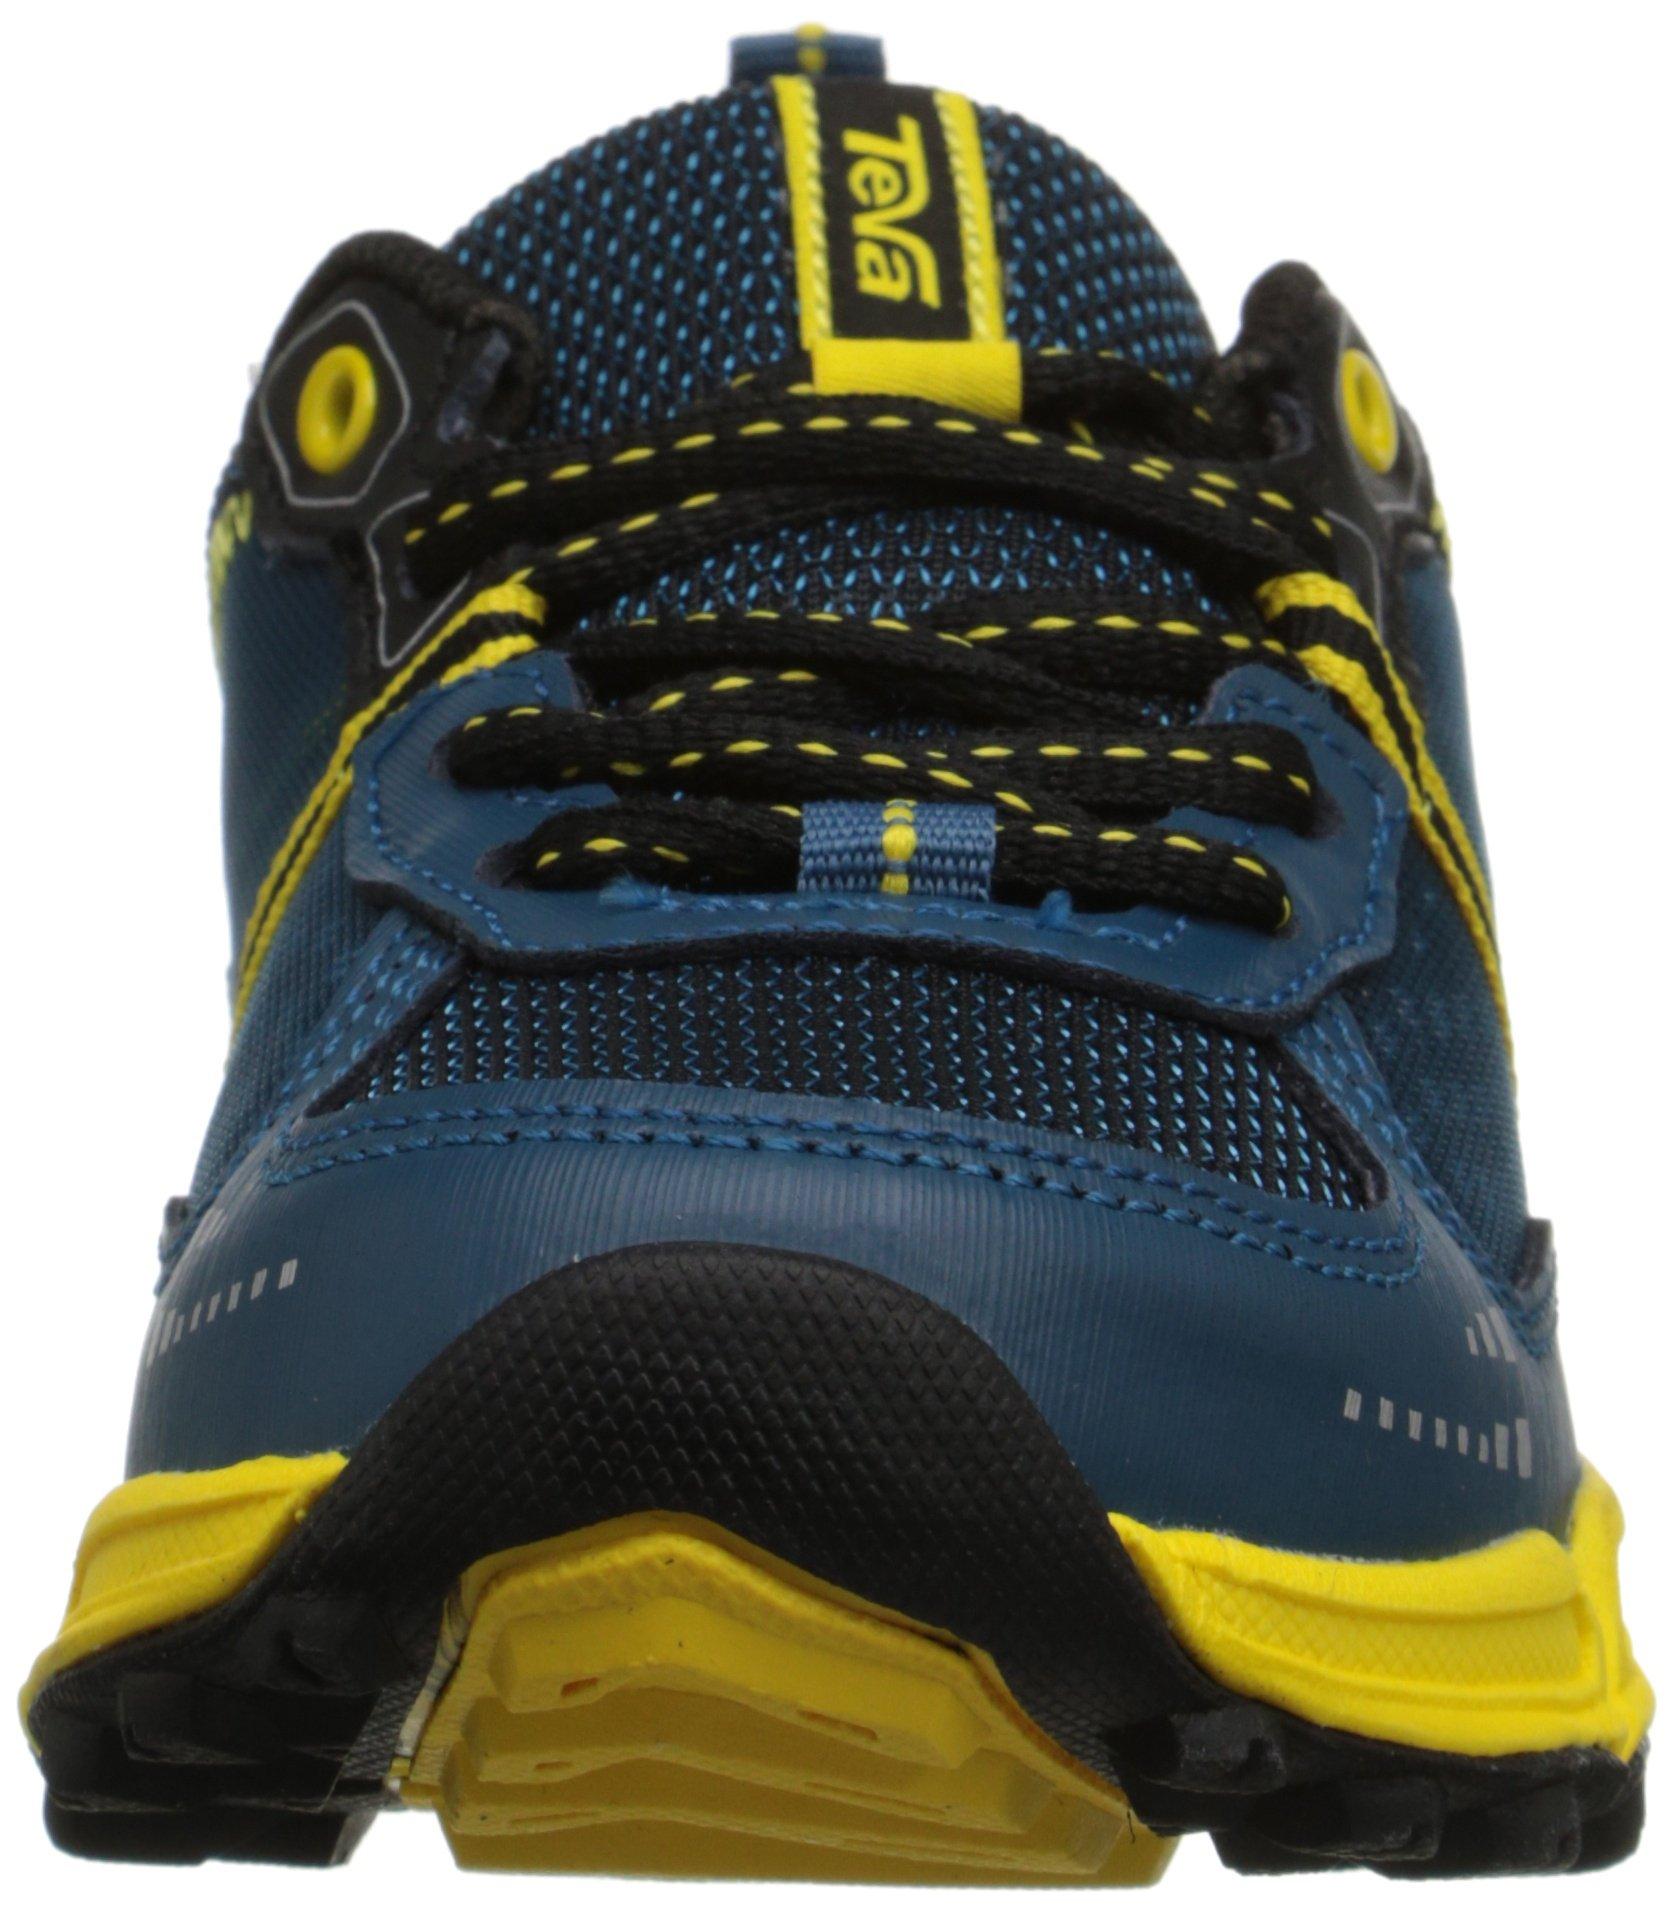 Teva Escapade Lo Athletic Trail Shoe (Little Kid/Big Kid), Blue/Yellow, 11 M US Little Kid by Teva (Image #4)